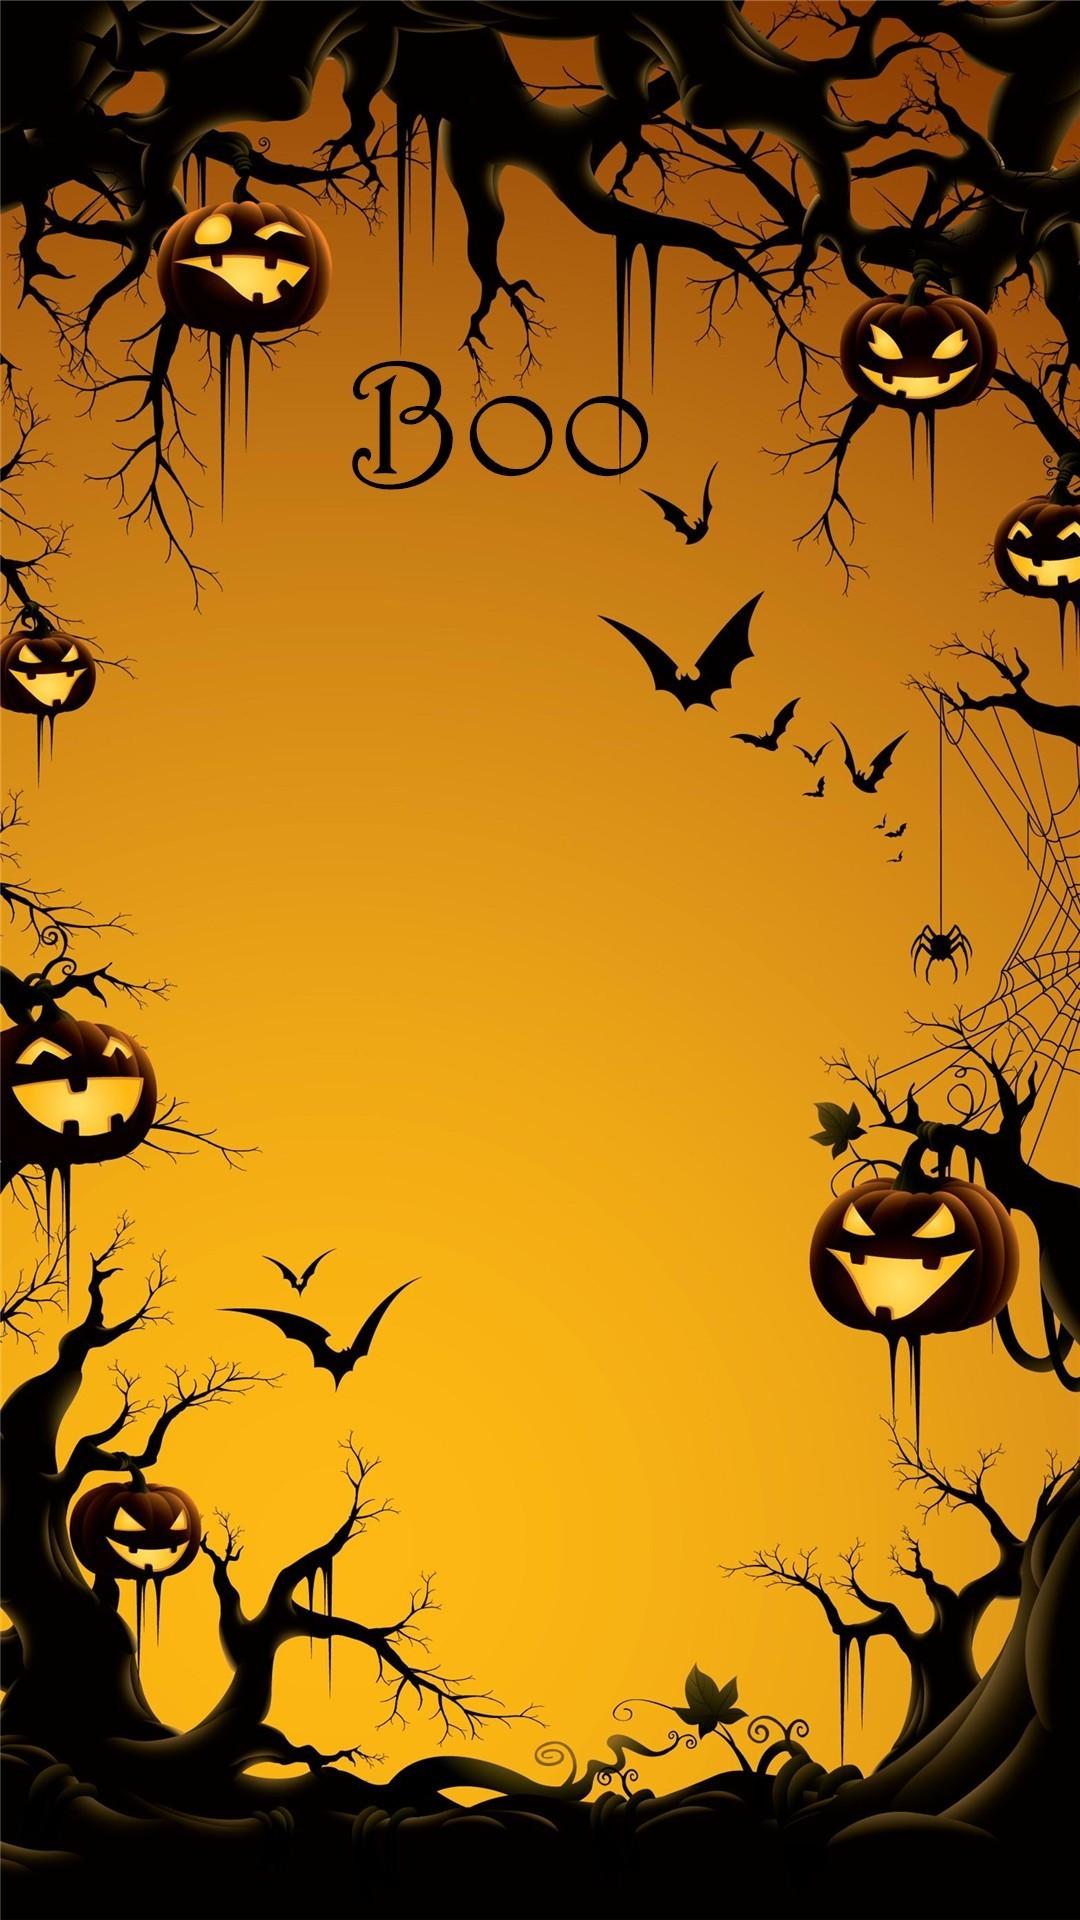 2014 Boo Halloween iPhone 6 plus wallpaper with pumpkin on the tree – bats  #2014